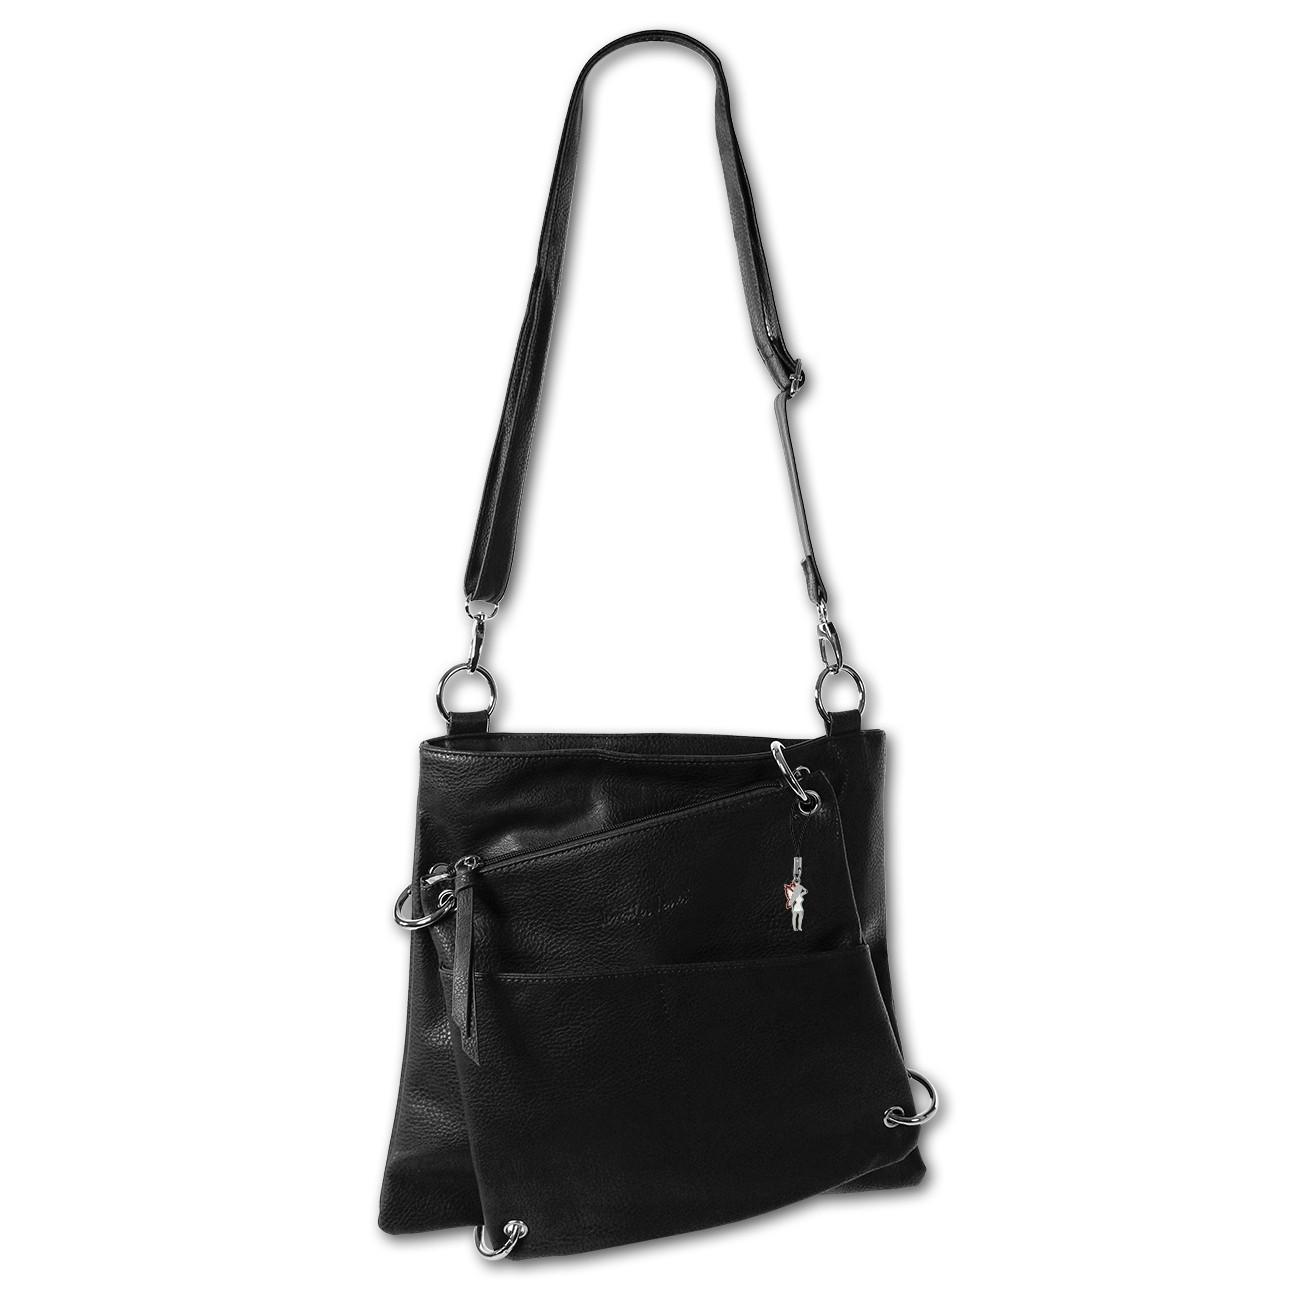 Umhängetasche schwarz Kunstleder Damen Handtasche 2in1 Jennifer Jones OTJ112S